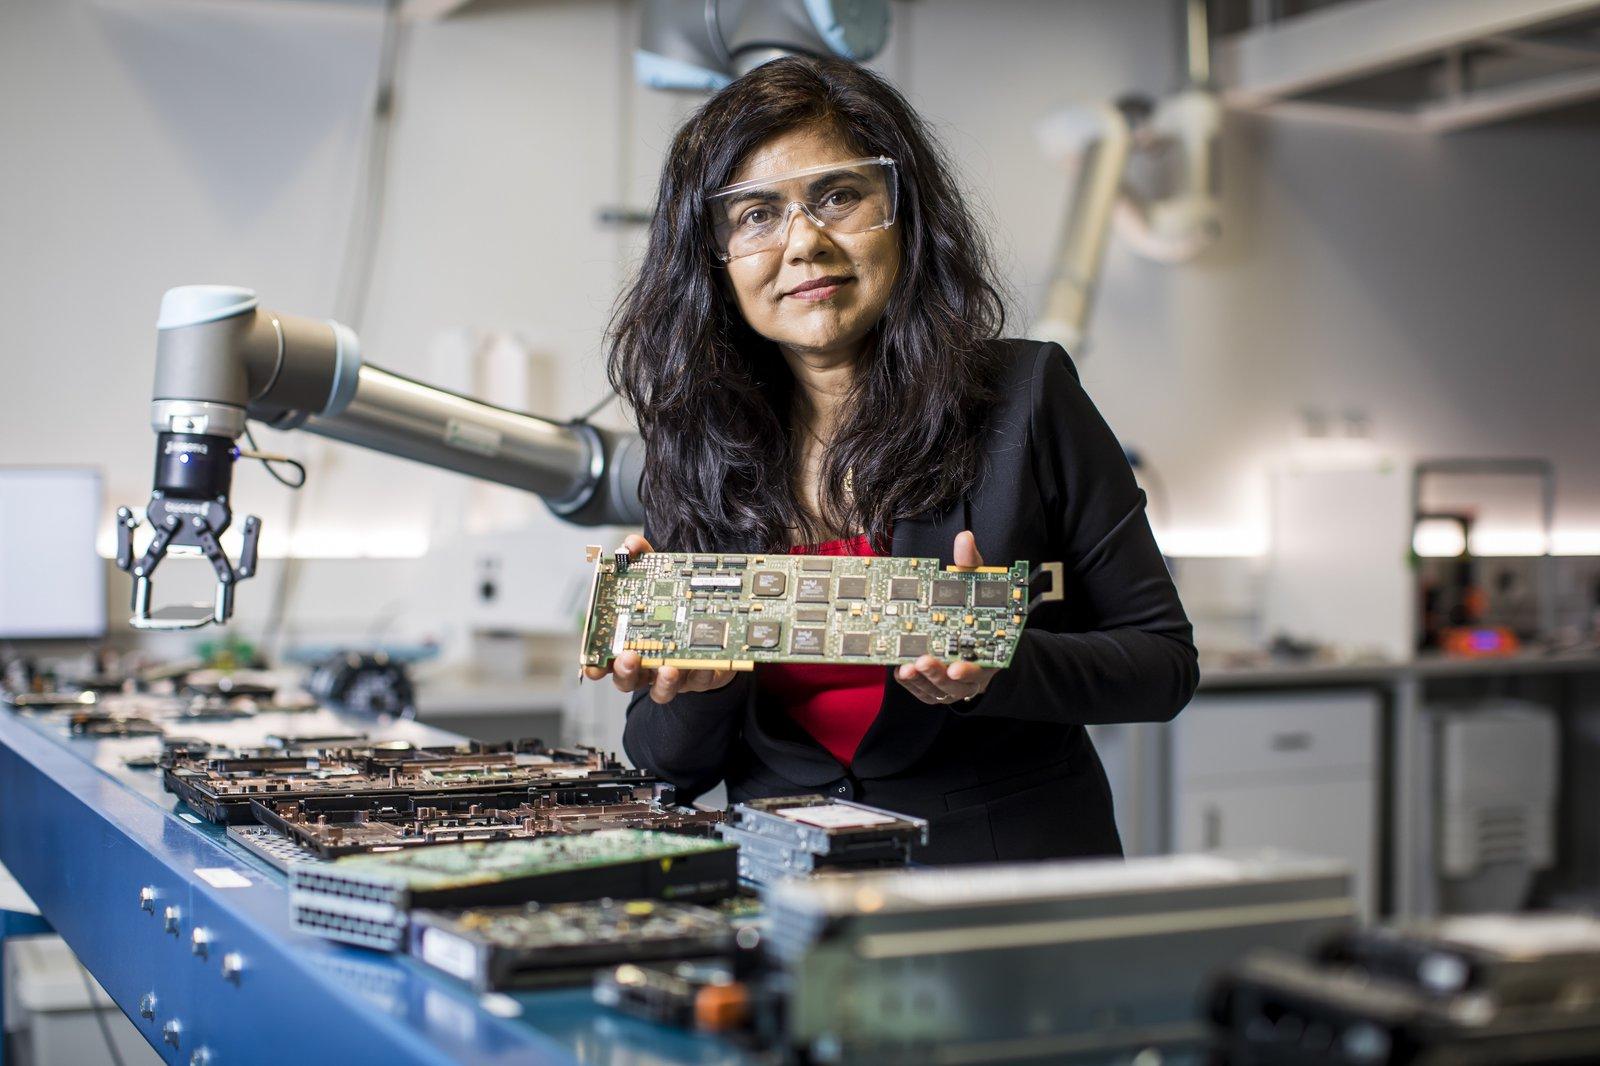 Professor Veena Sahajwalla, UNSW